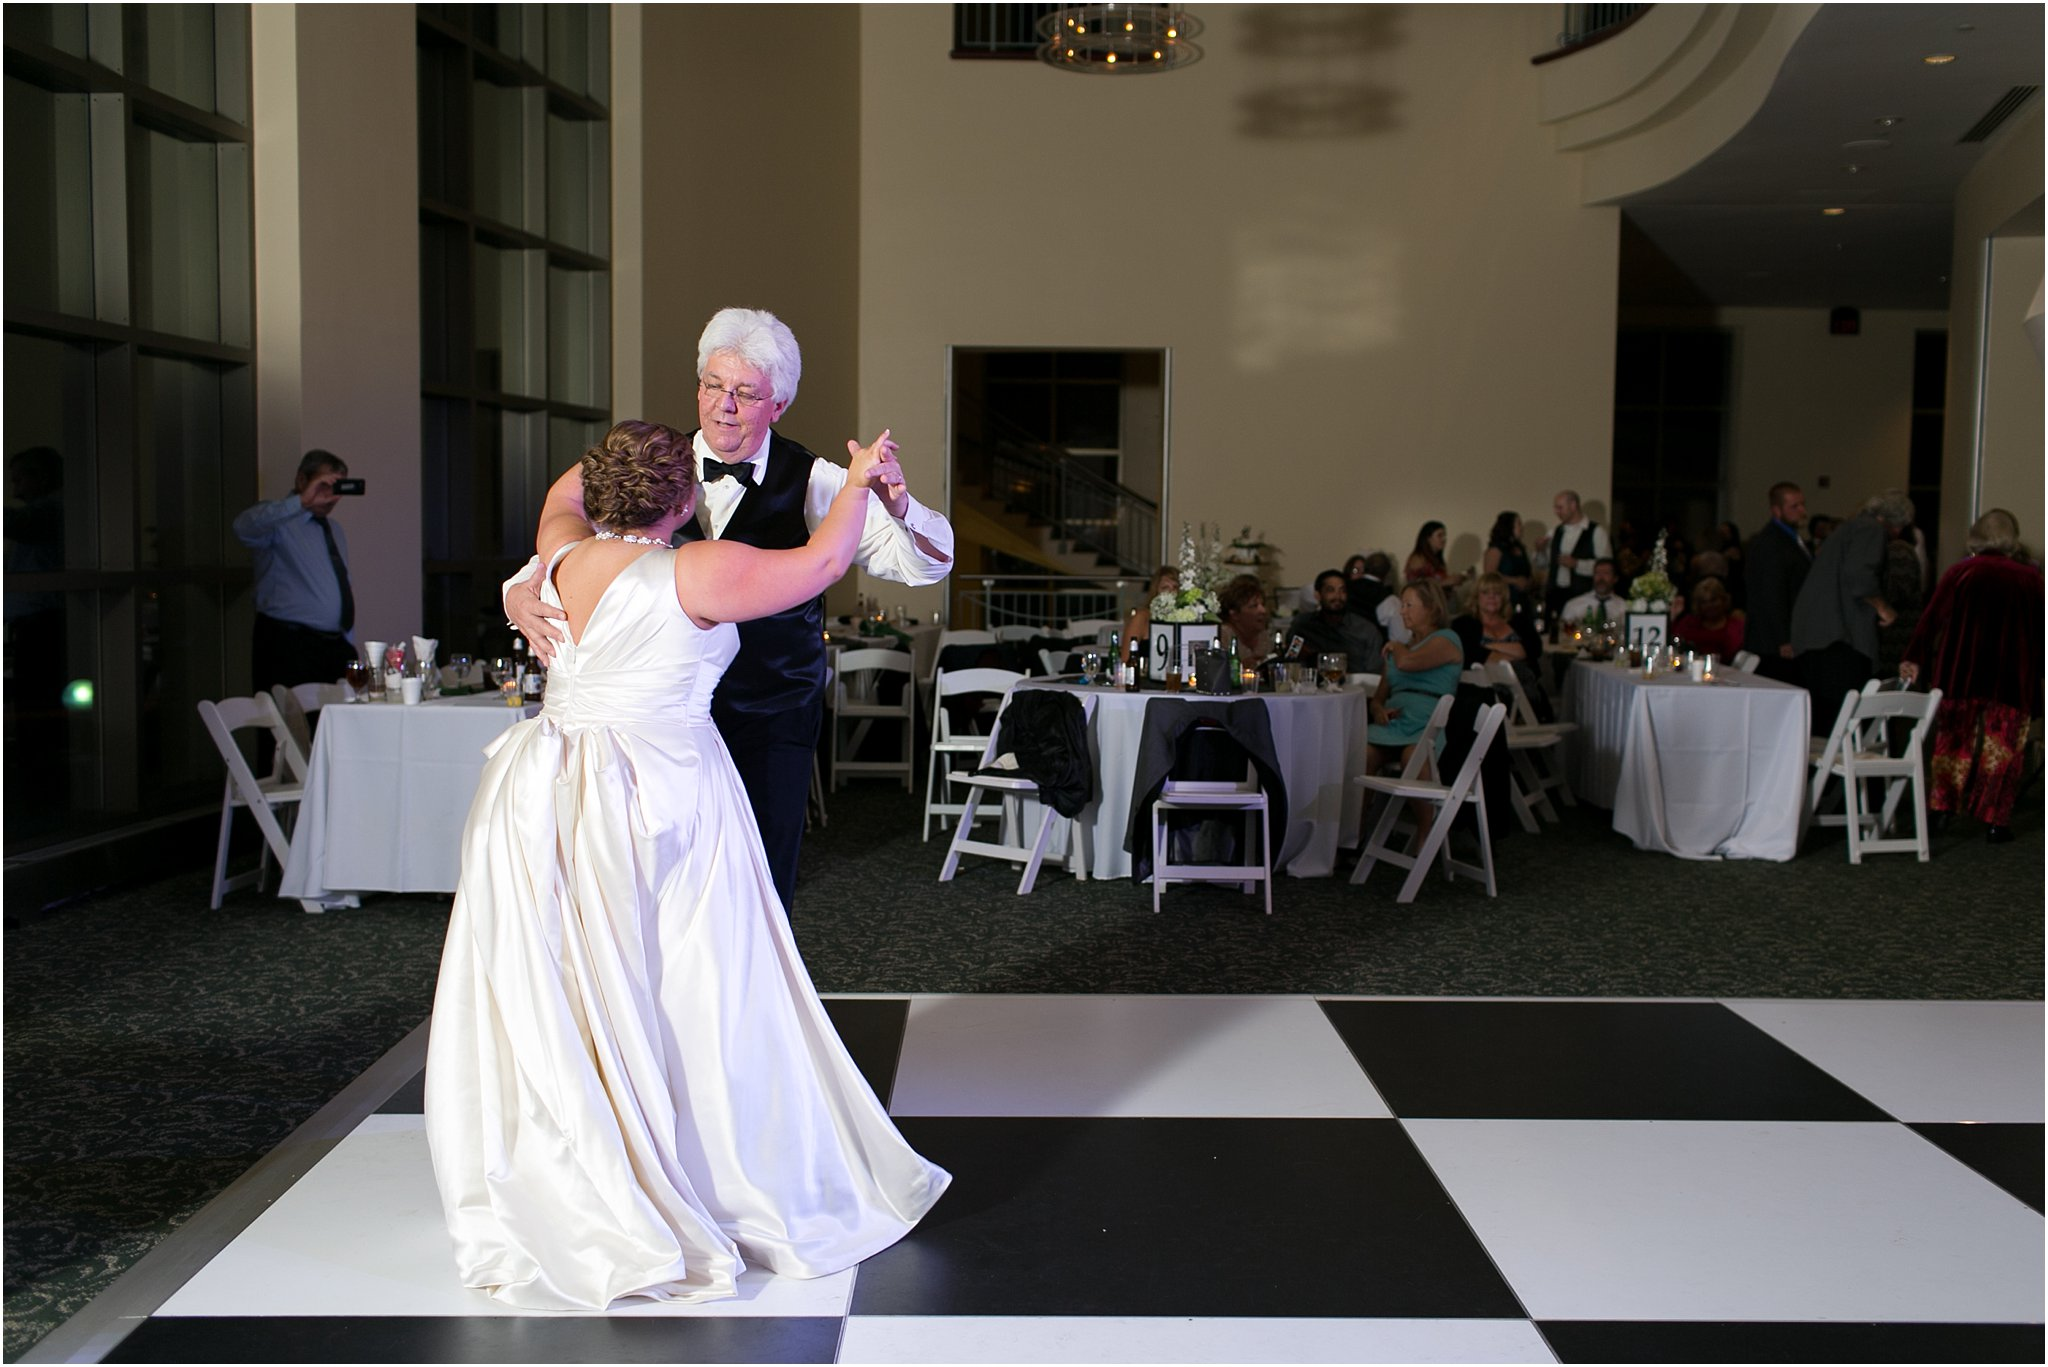 va_jessica_ryan_photography_virginia_wedding_norfolk_harrison_opera_house_norfolk_arts_district_portraits_3847